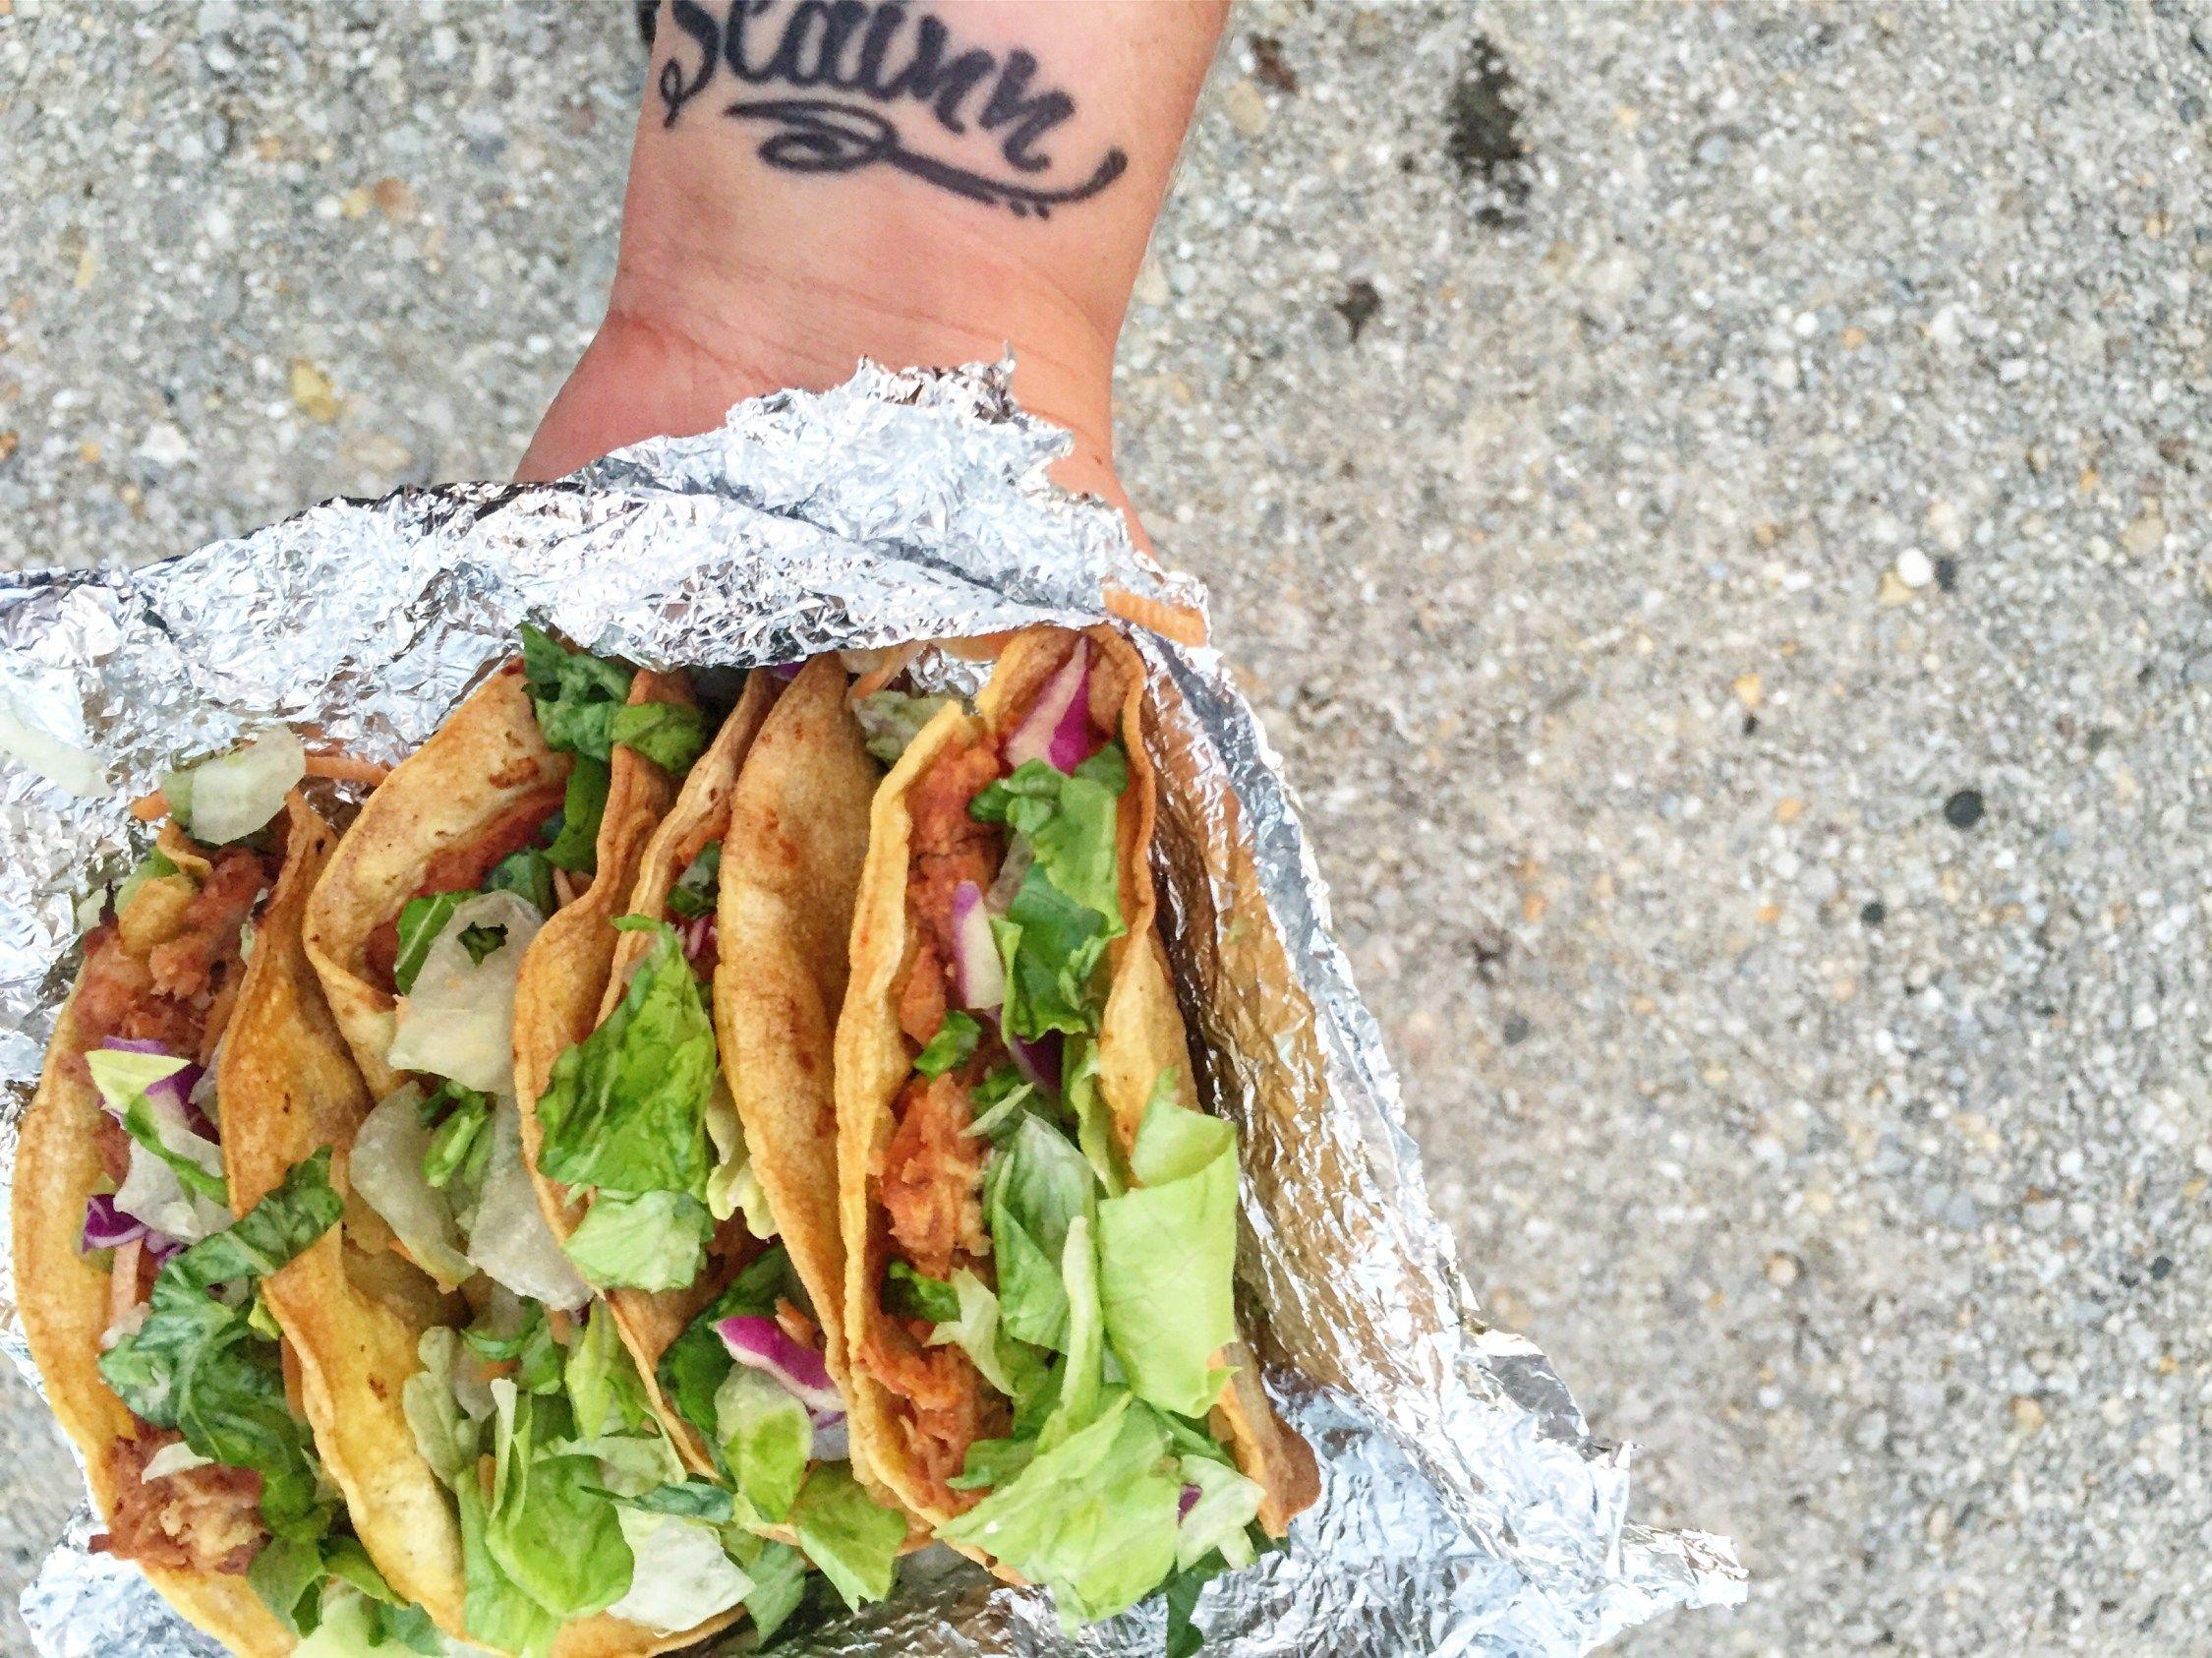 dailydoseofpepper.com 2016 09 02 chicken-street-tacos-life